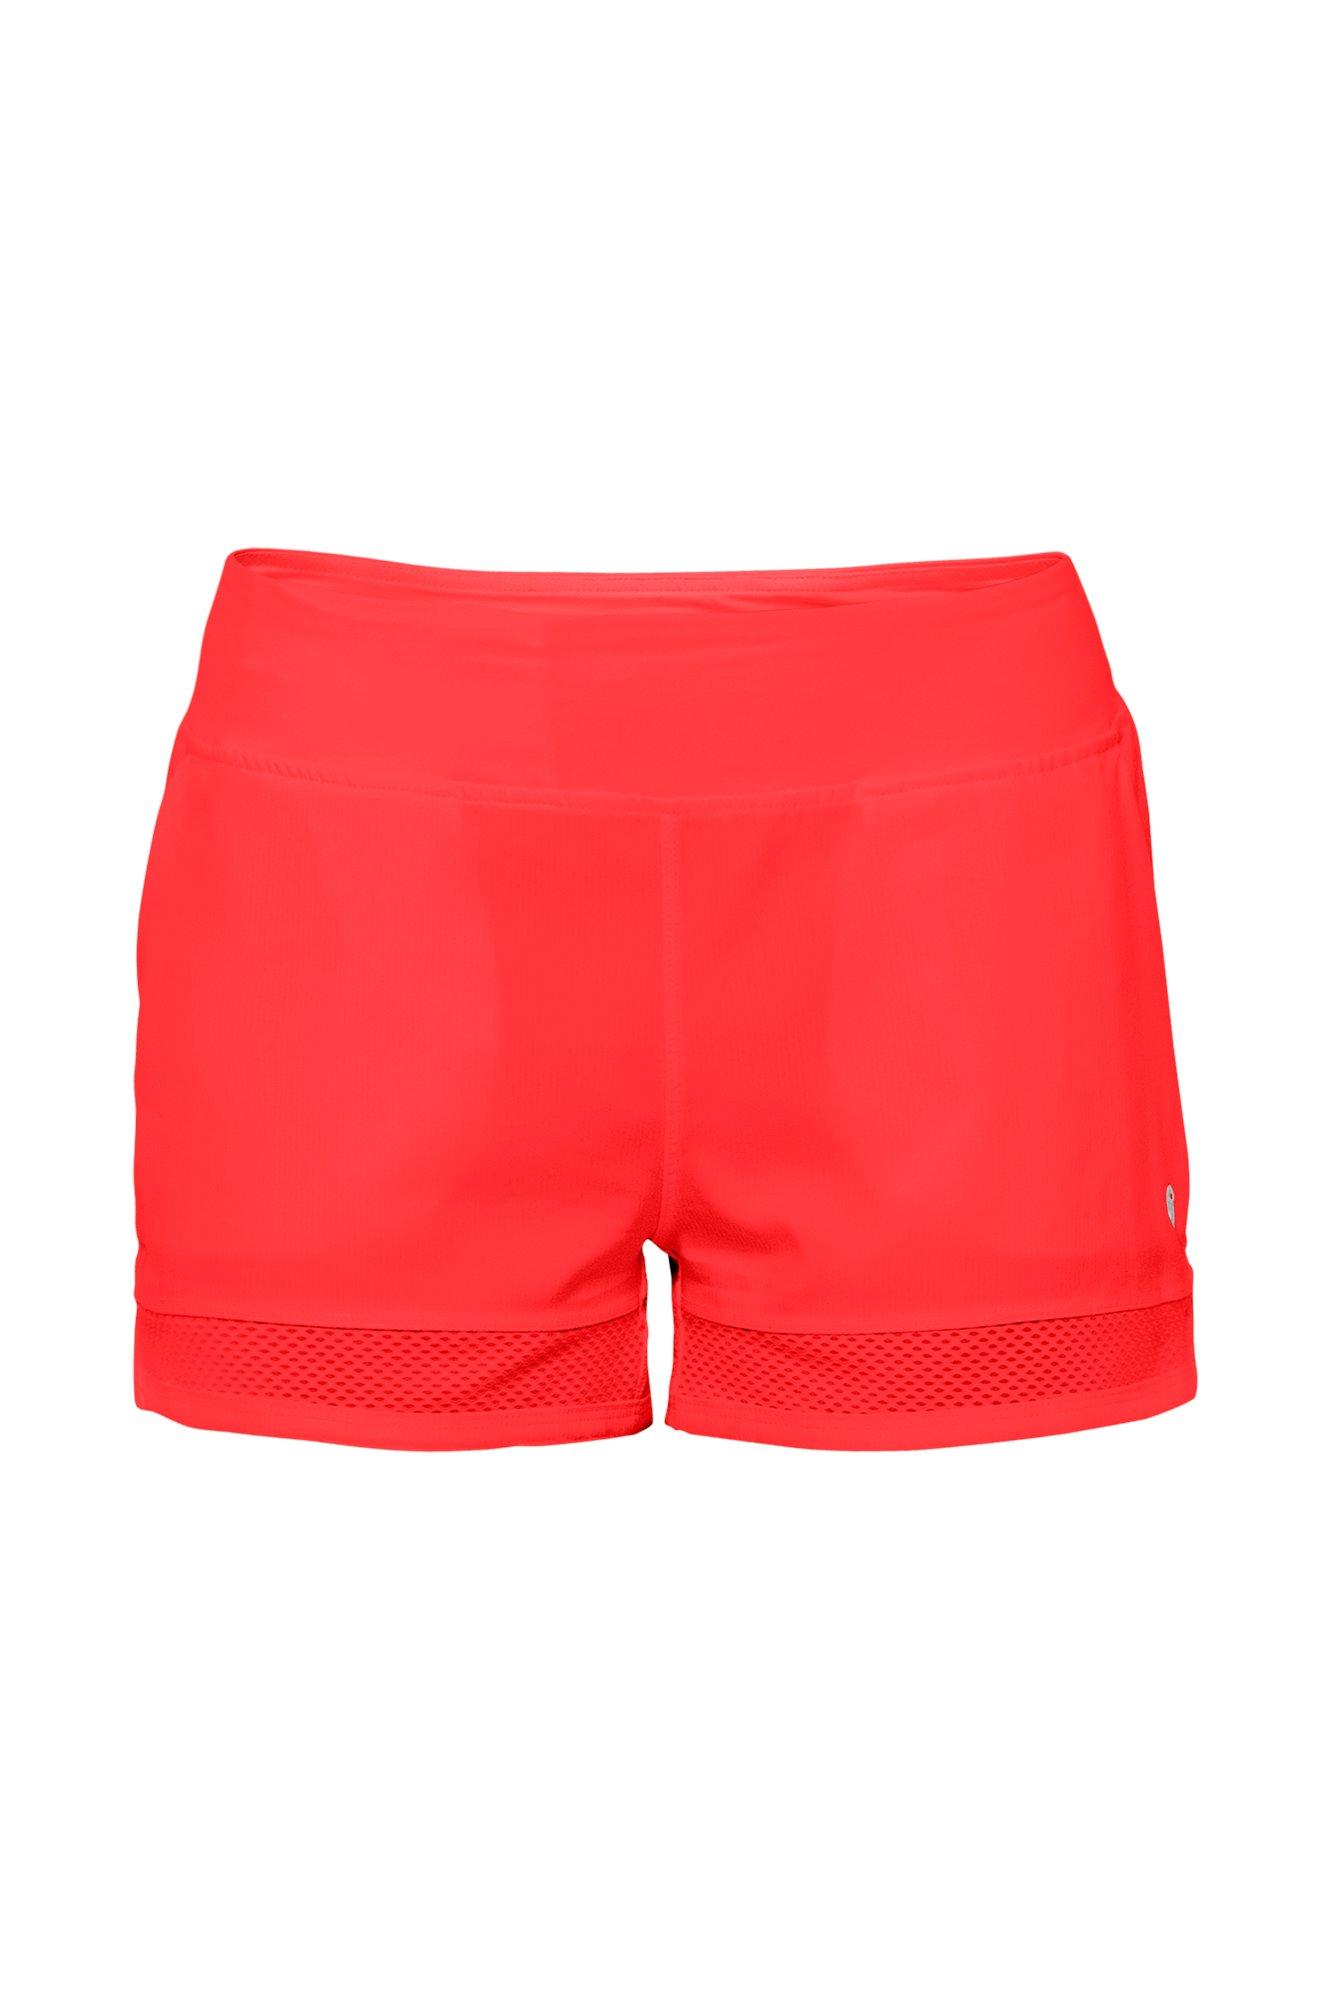 Lija Women's Shadow Mesh Cut Out Shorts, Poppy, Large